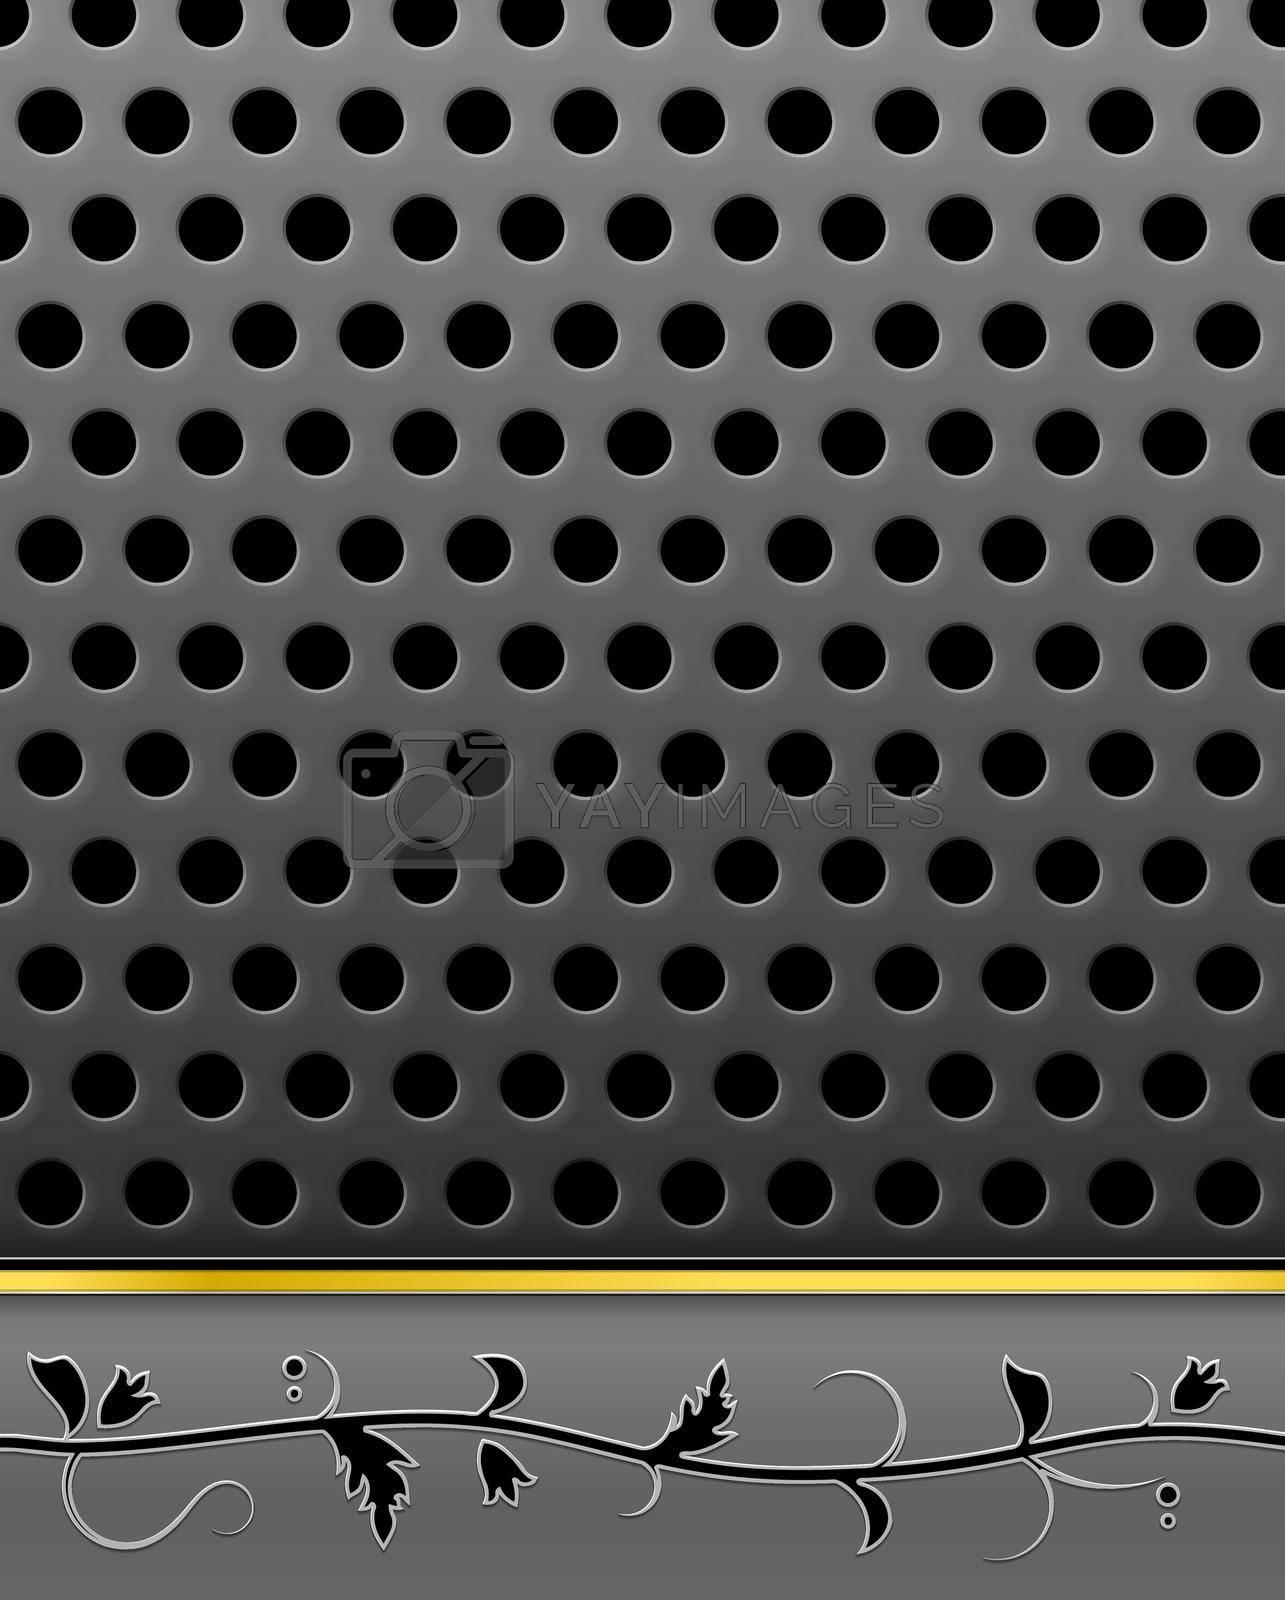 Royalty free image of Speaker Texture by mstjahanara